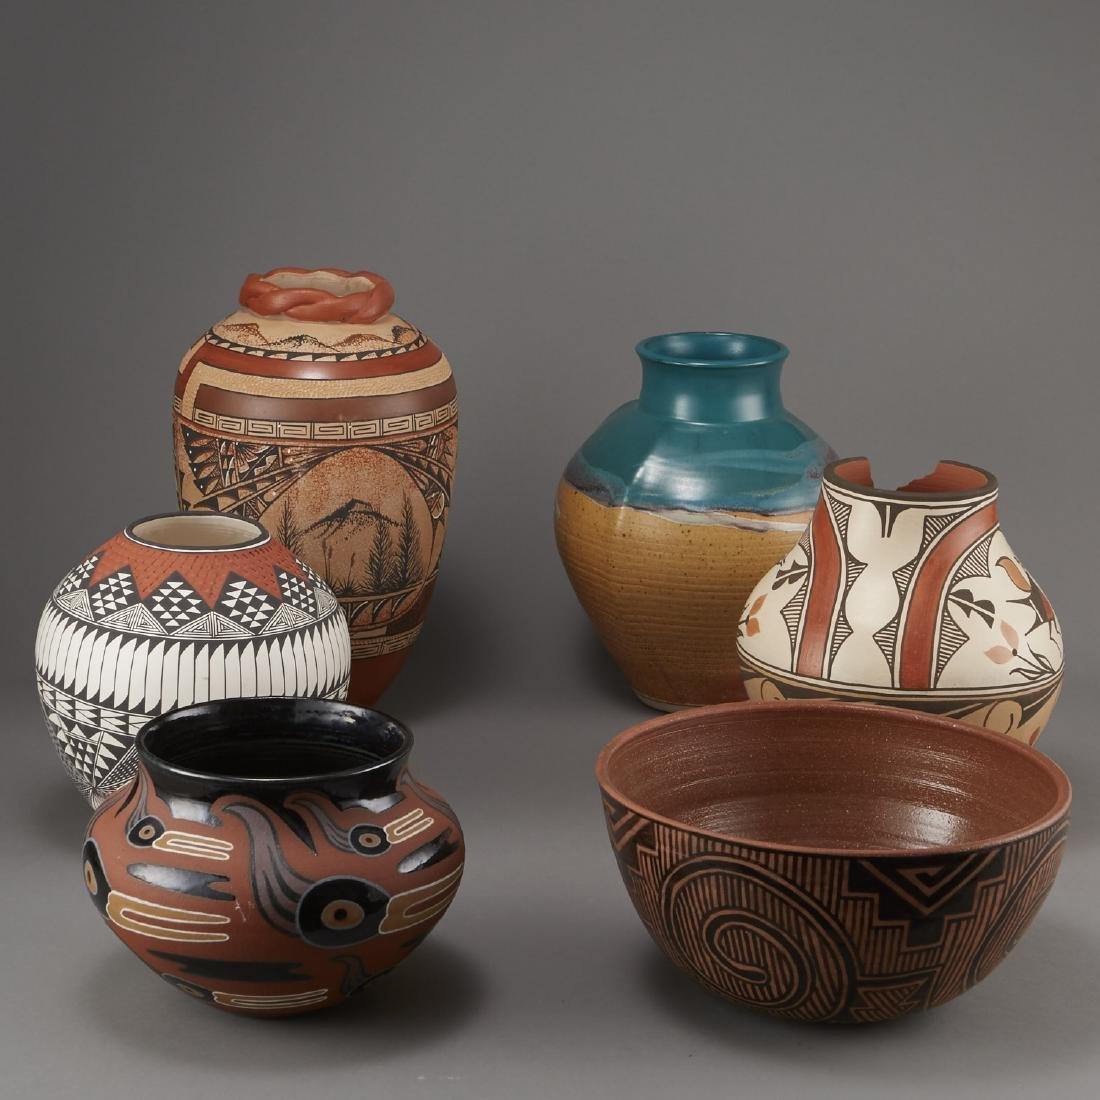 6 Pueblo Pottery Pots incld Fragua, Nez, Medina - 4